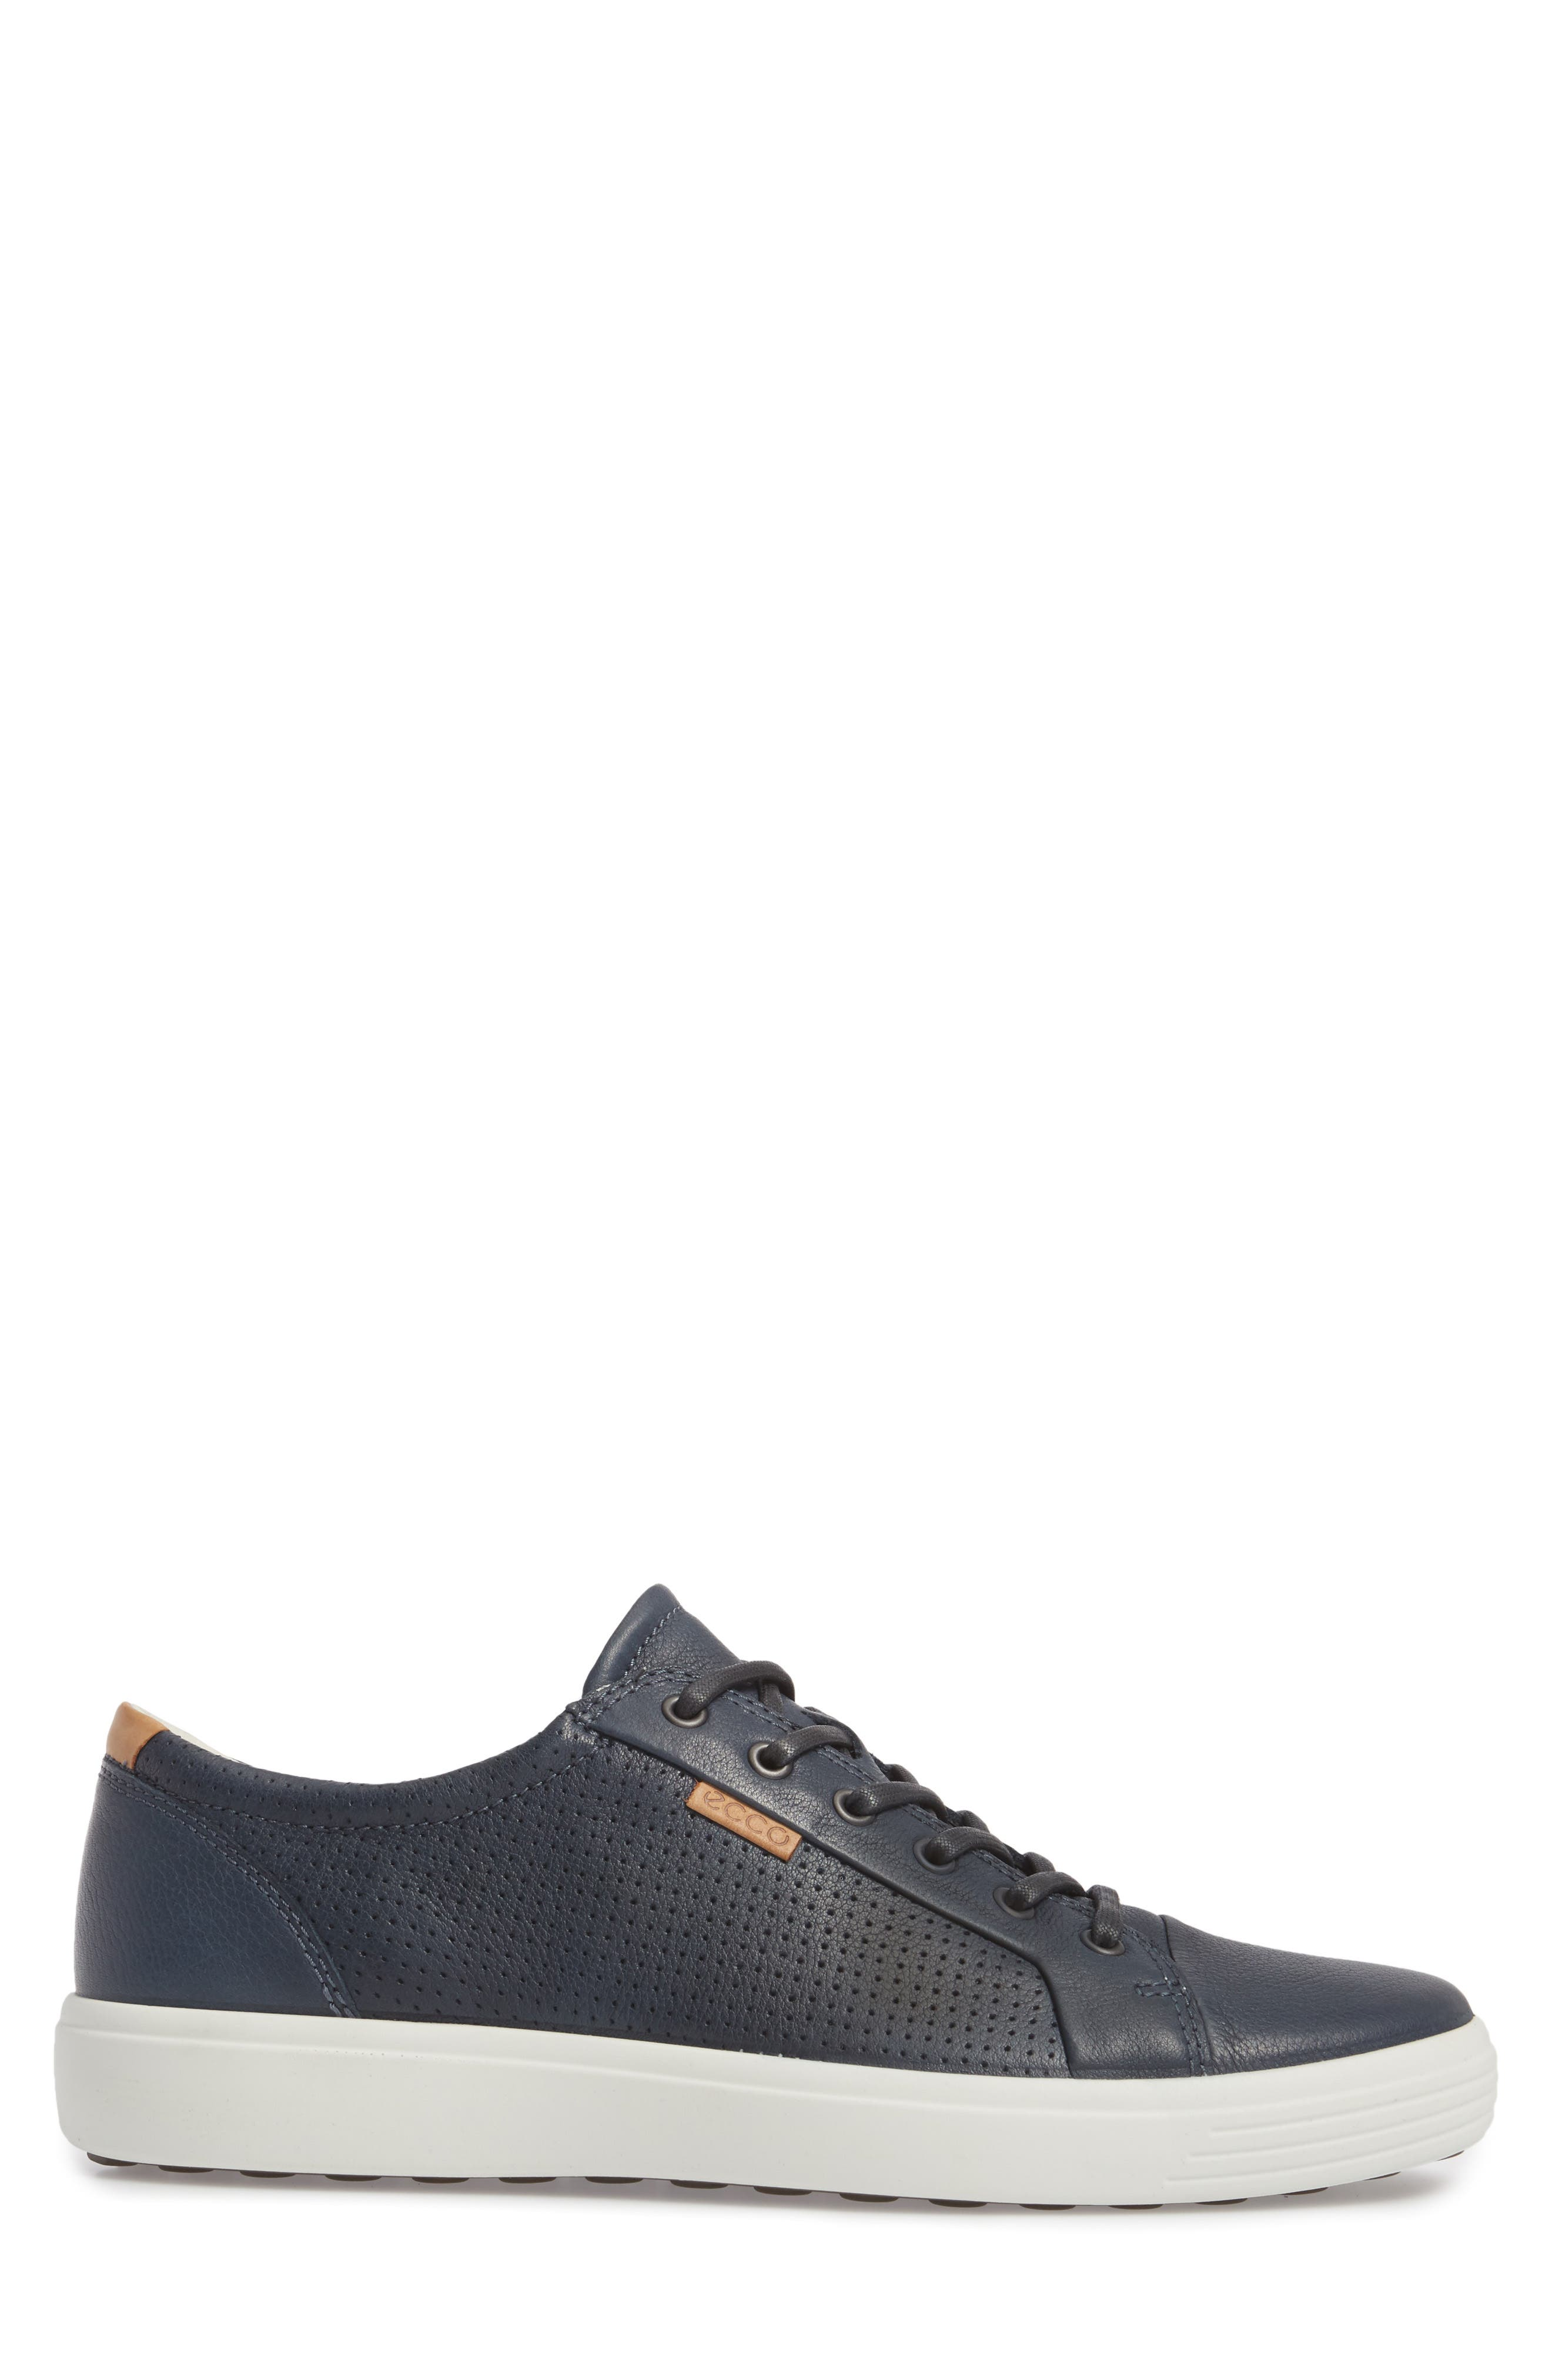 'Soft 7' Sneaker,                             Alternate thumbnail 3, color,                             NAVY LEATHER